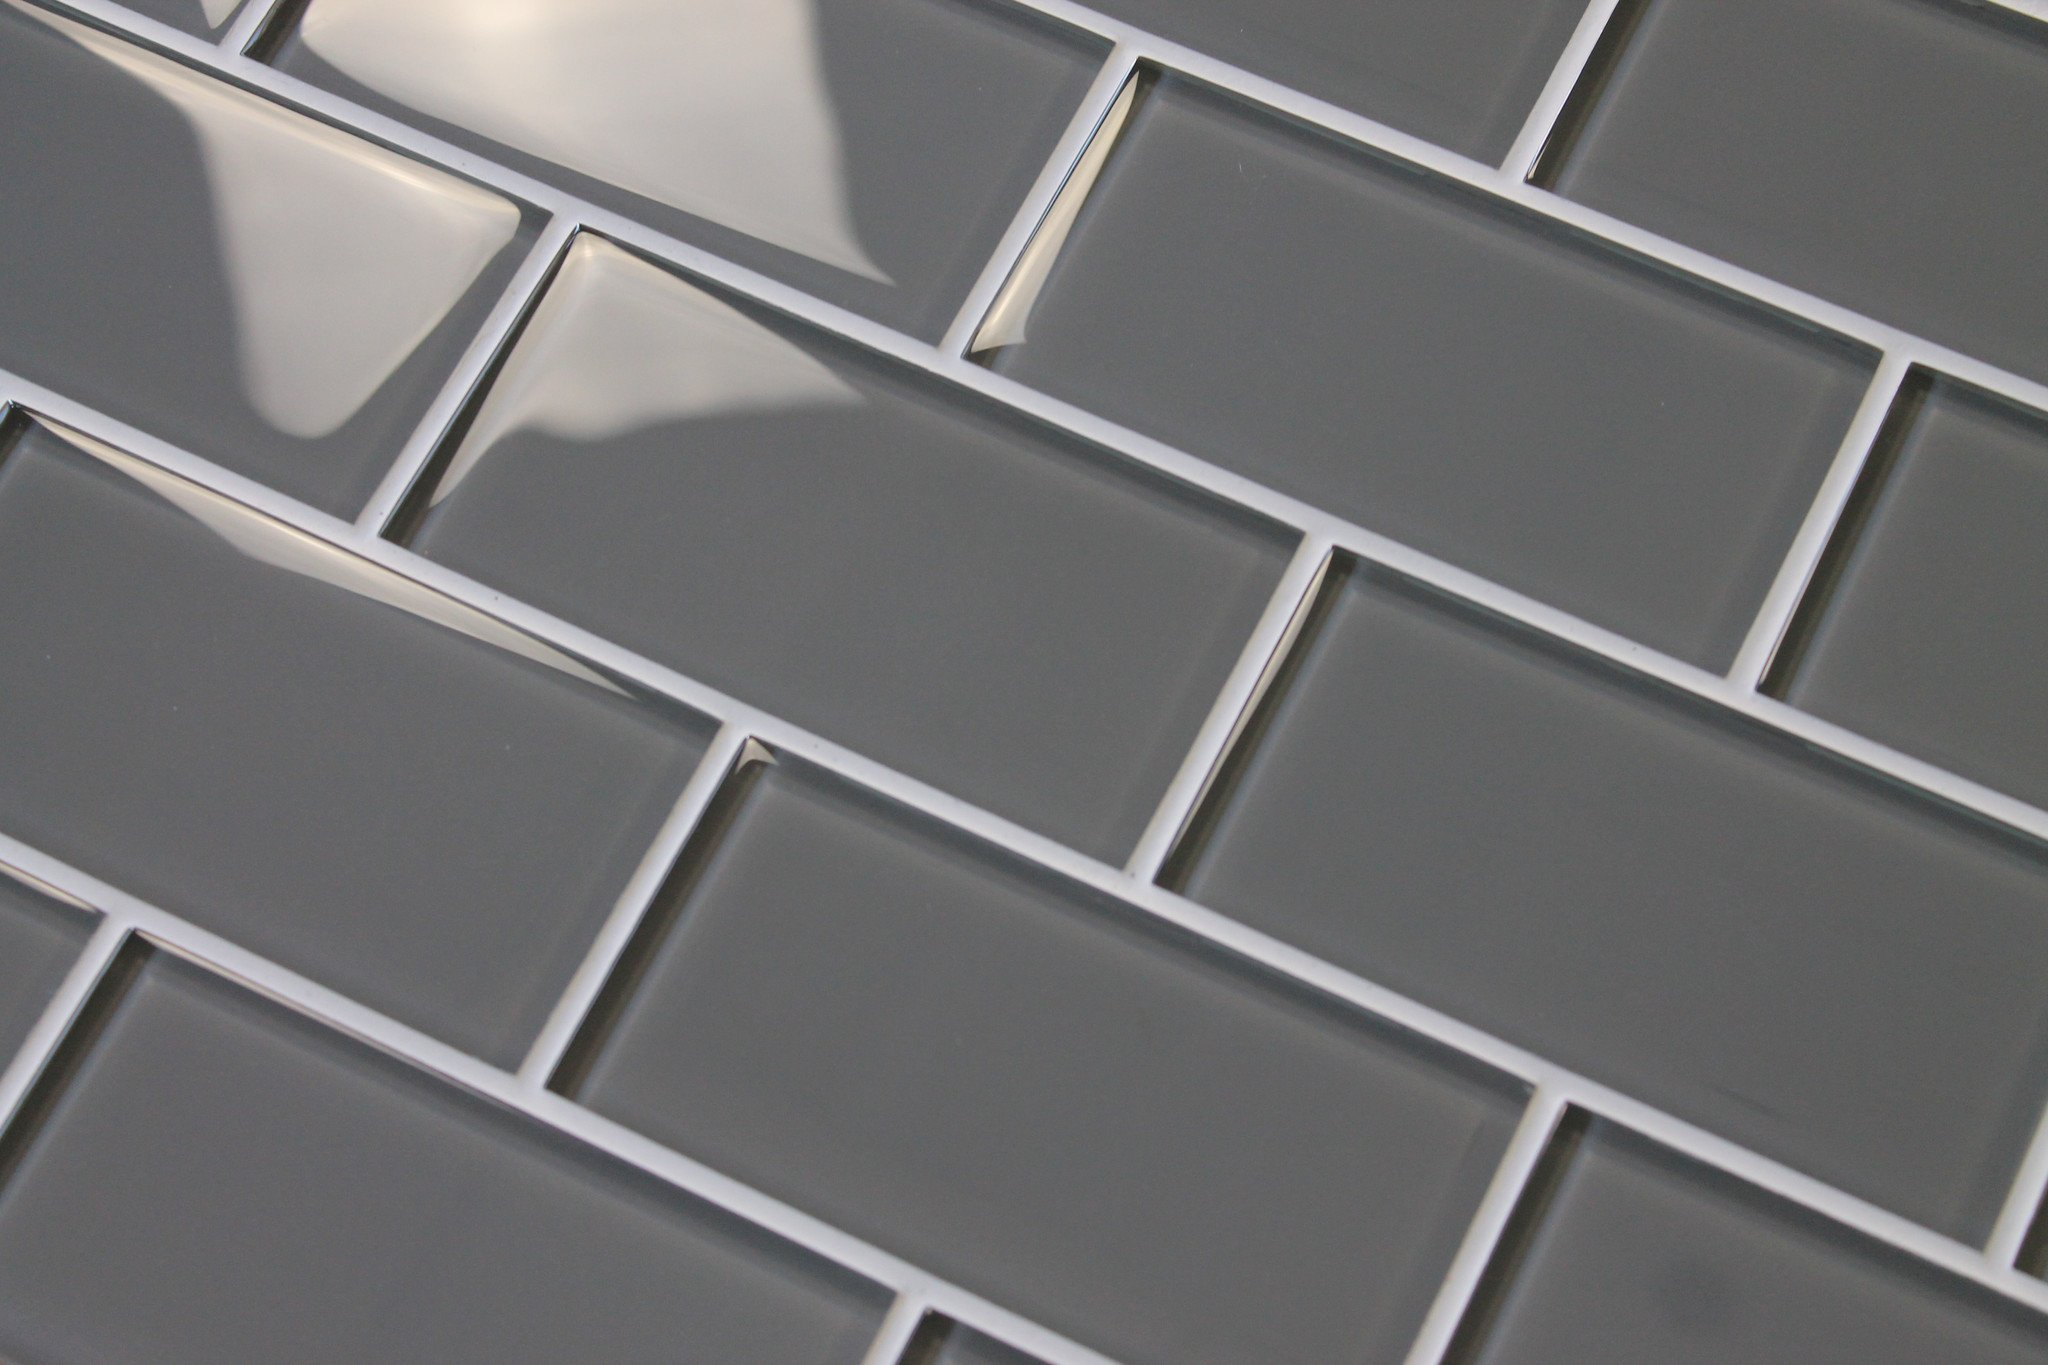 10 Square Feet - Pebble Gray 3'' x 6'' Glass Subway Tiles